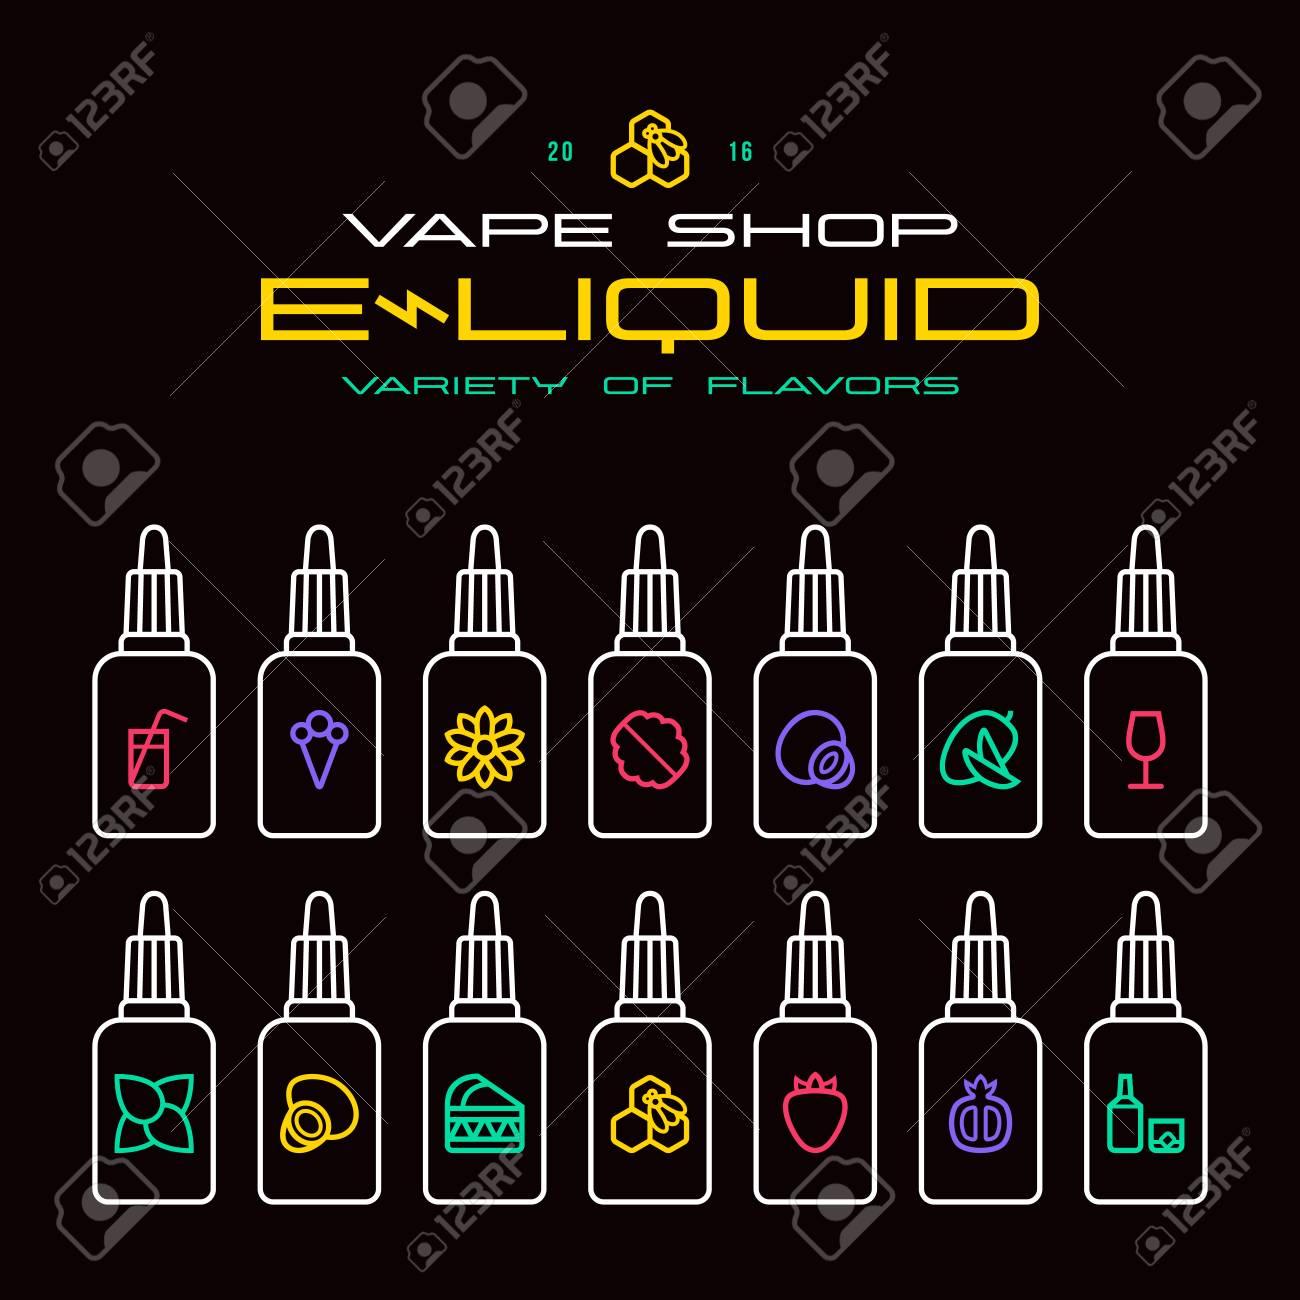 Vape shop e-liquid flavors icons set in thin line style  Bright